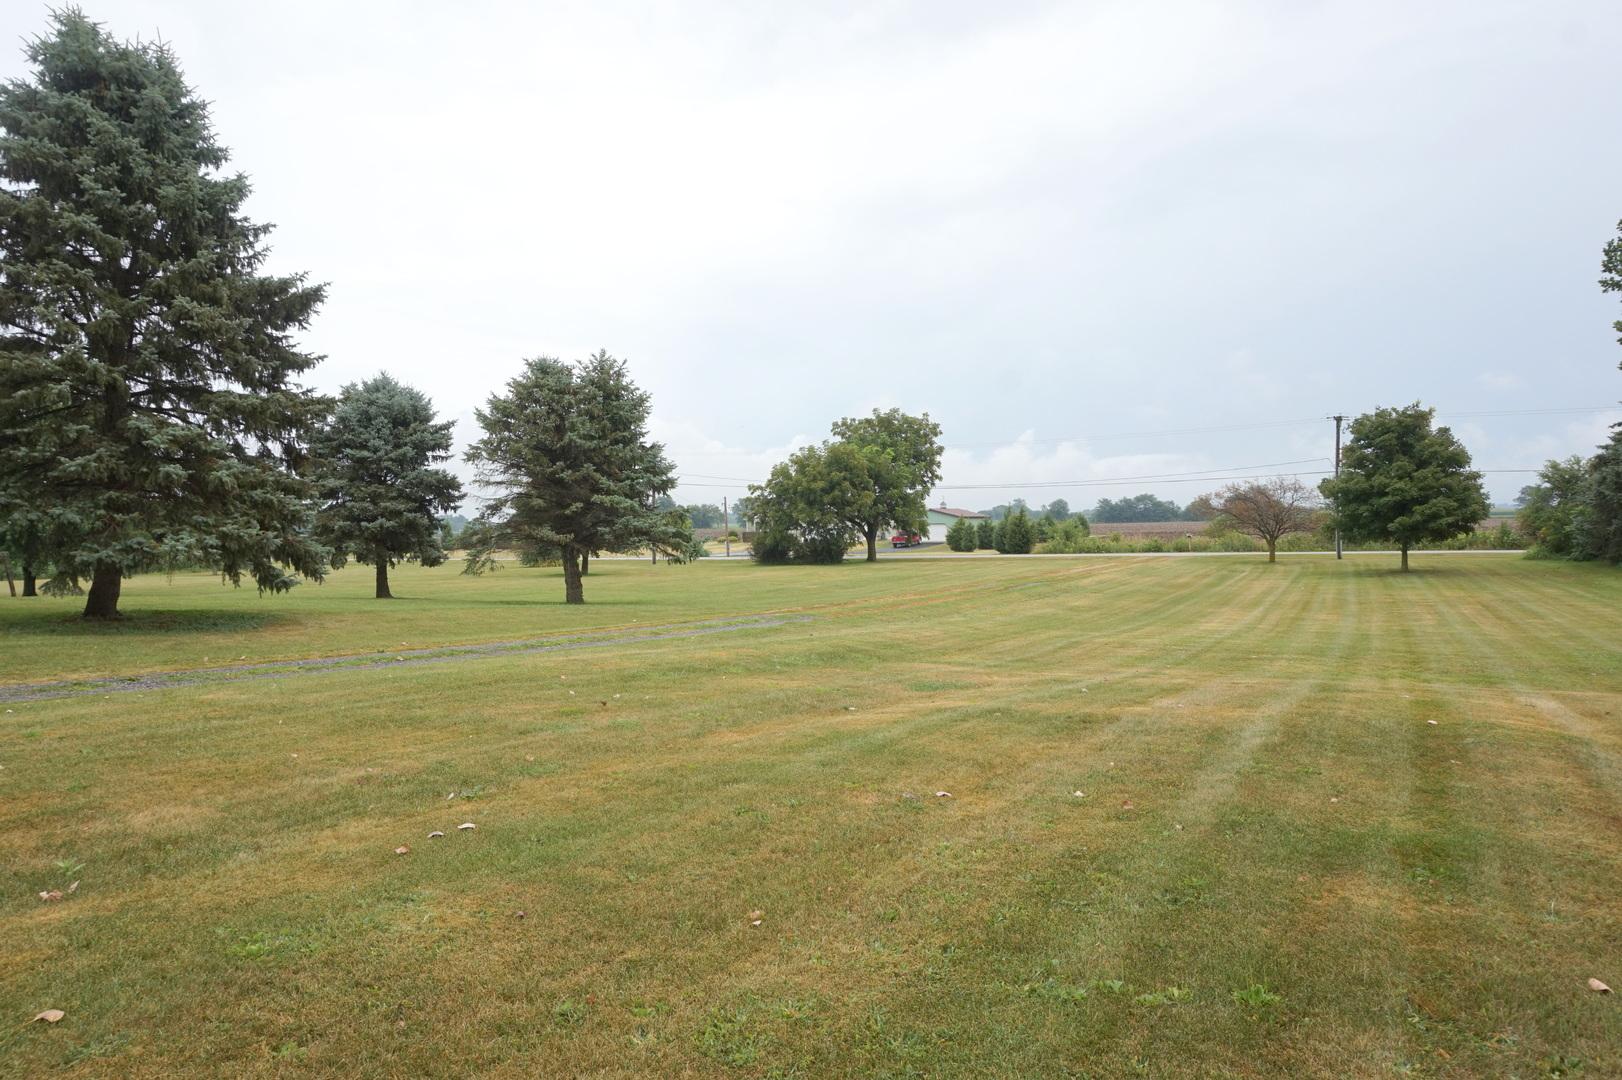 29212 South Ridgeland, Peotone, Illinois, 60468